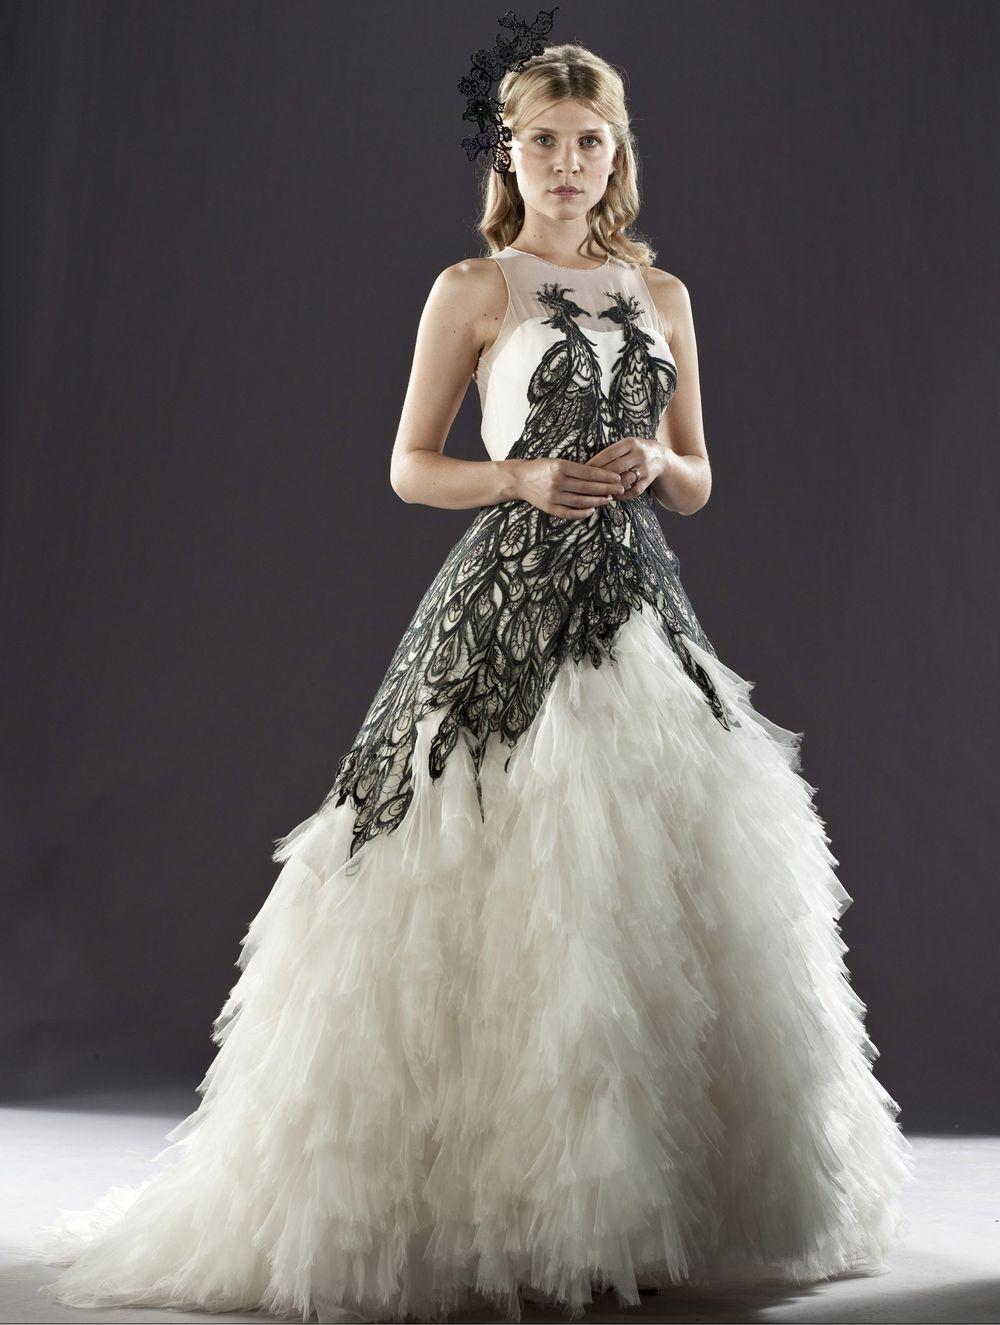 Fleur Delacour S Wedding Dress Harry Potter Hochzeitskleid Pfauenkleid Fleur Delacour